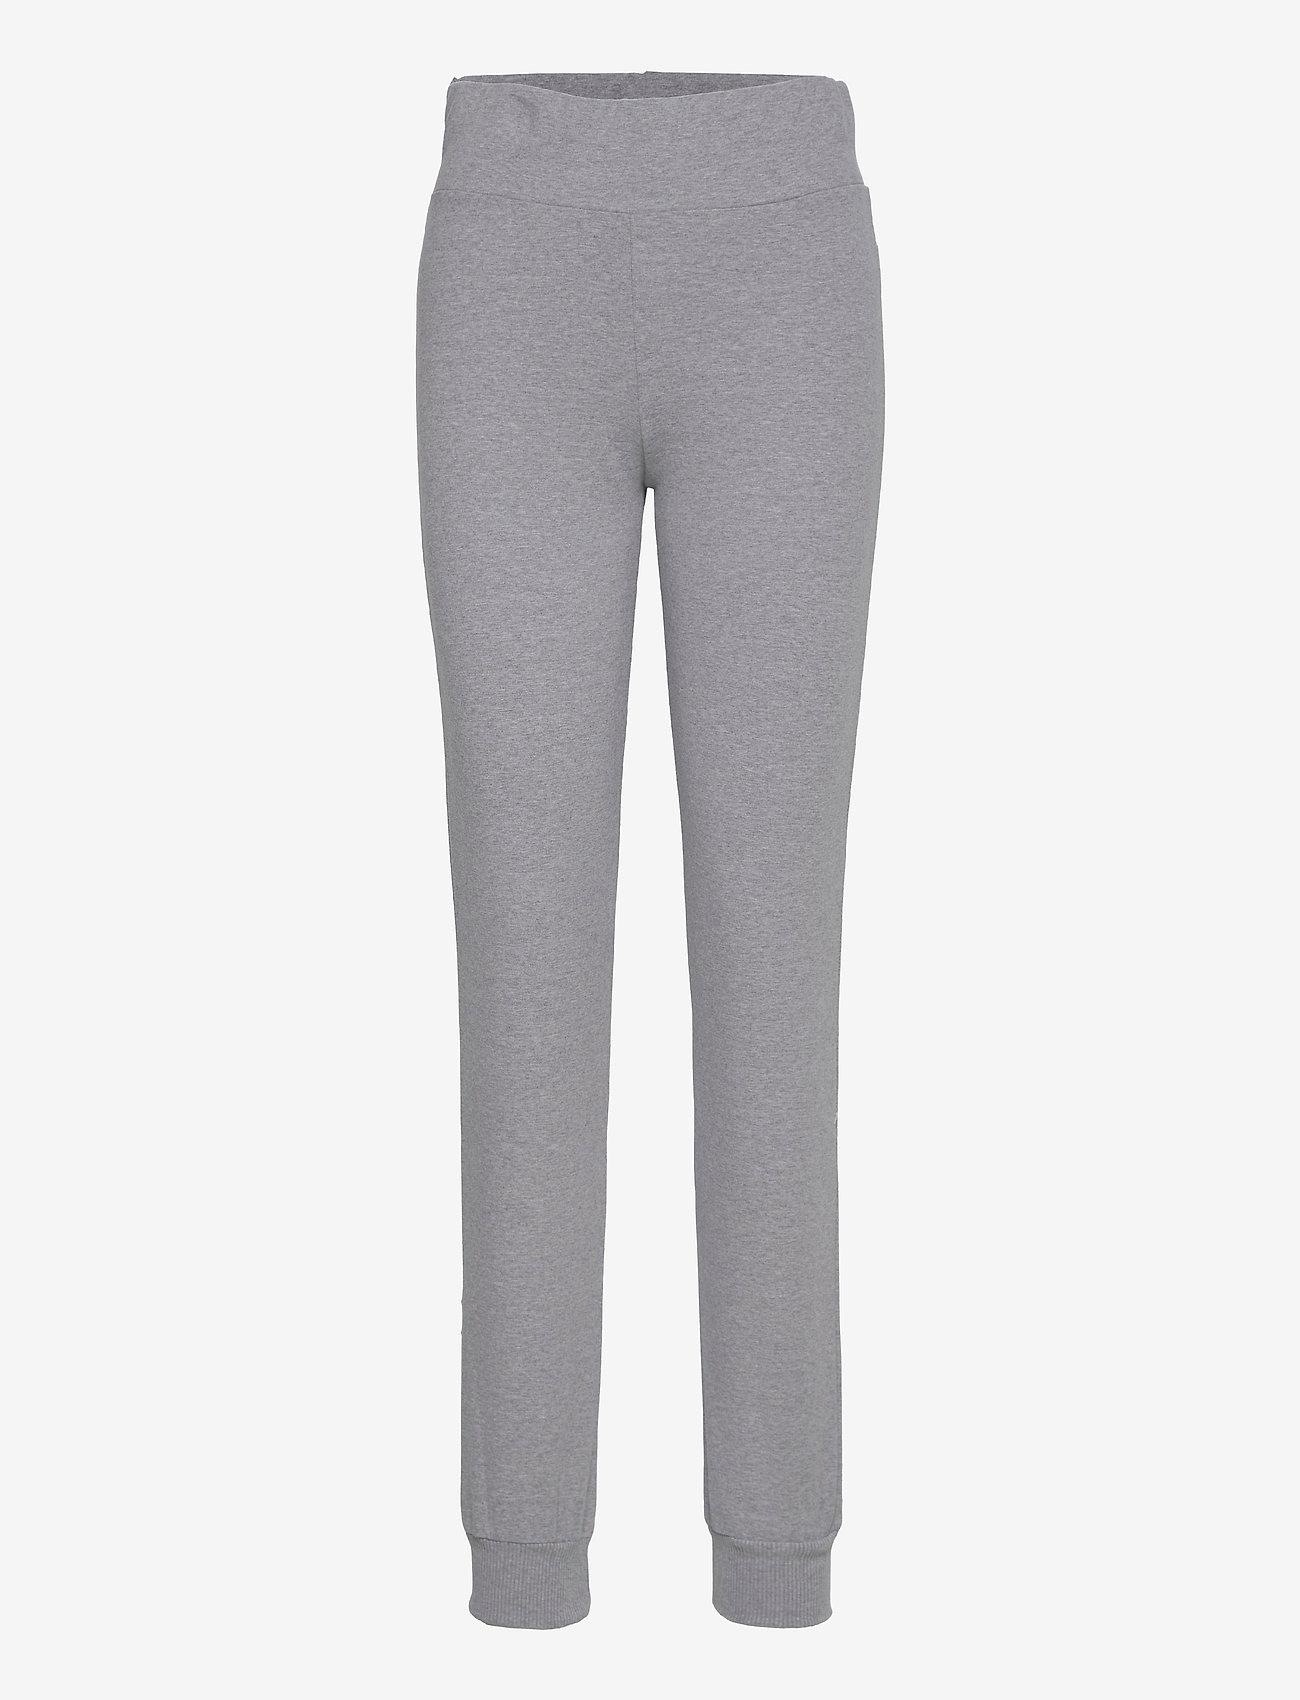 ella&il - Bibbi pants - vêtements - grey - 0